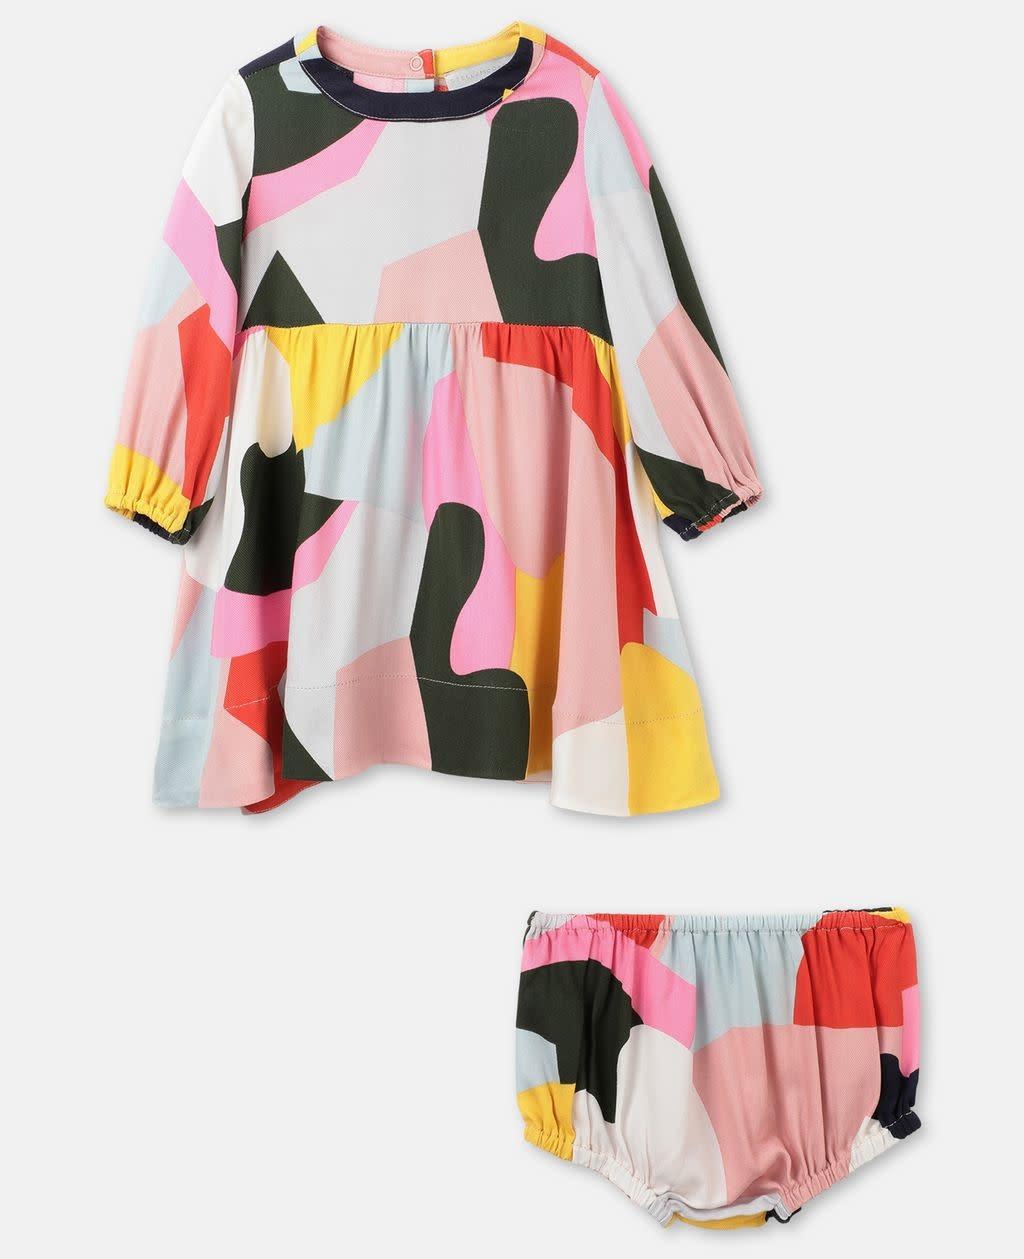 STELLA MCCARTNEY Long Sleeve Colorblock Dress